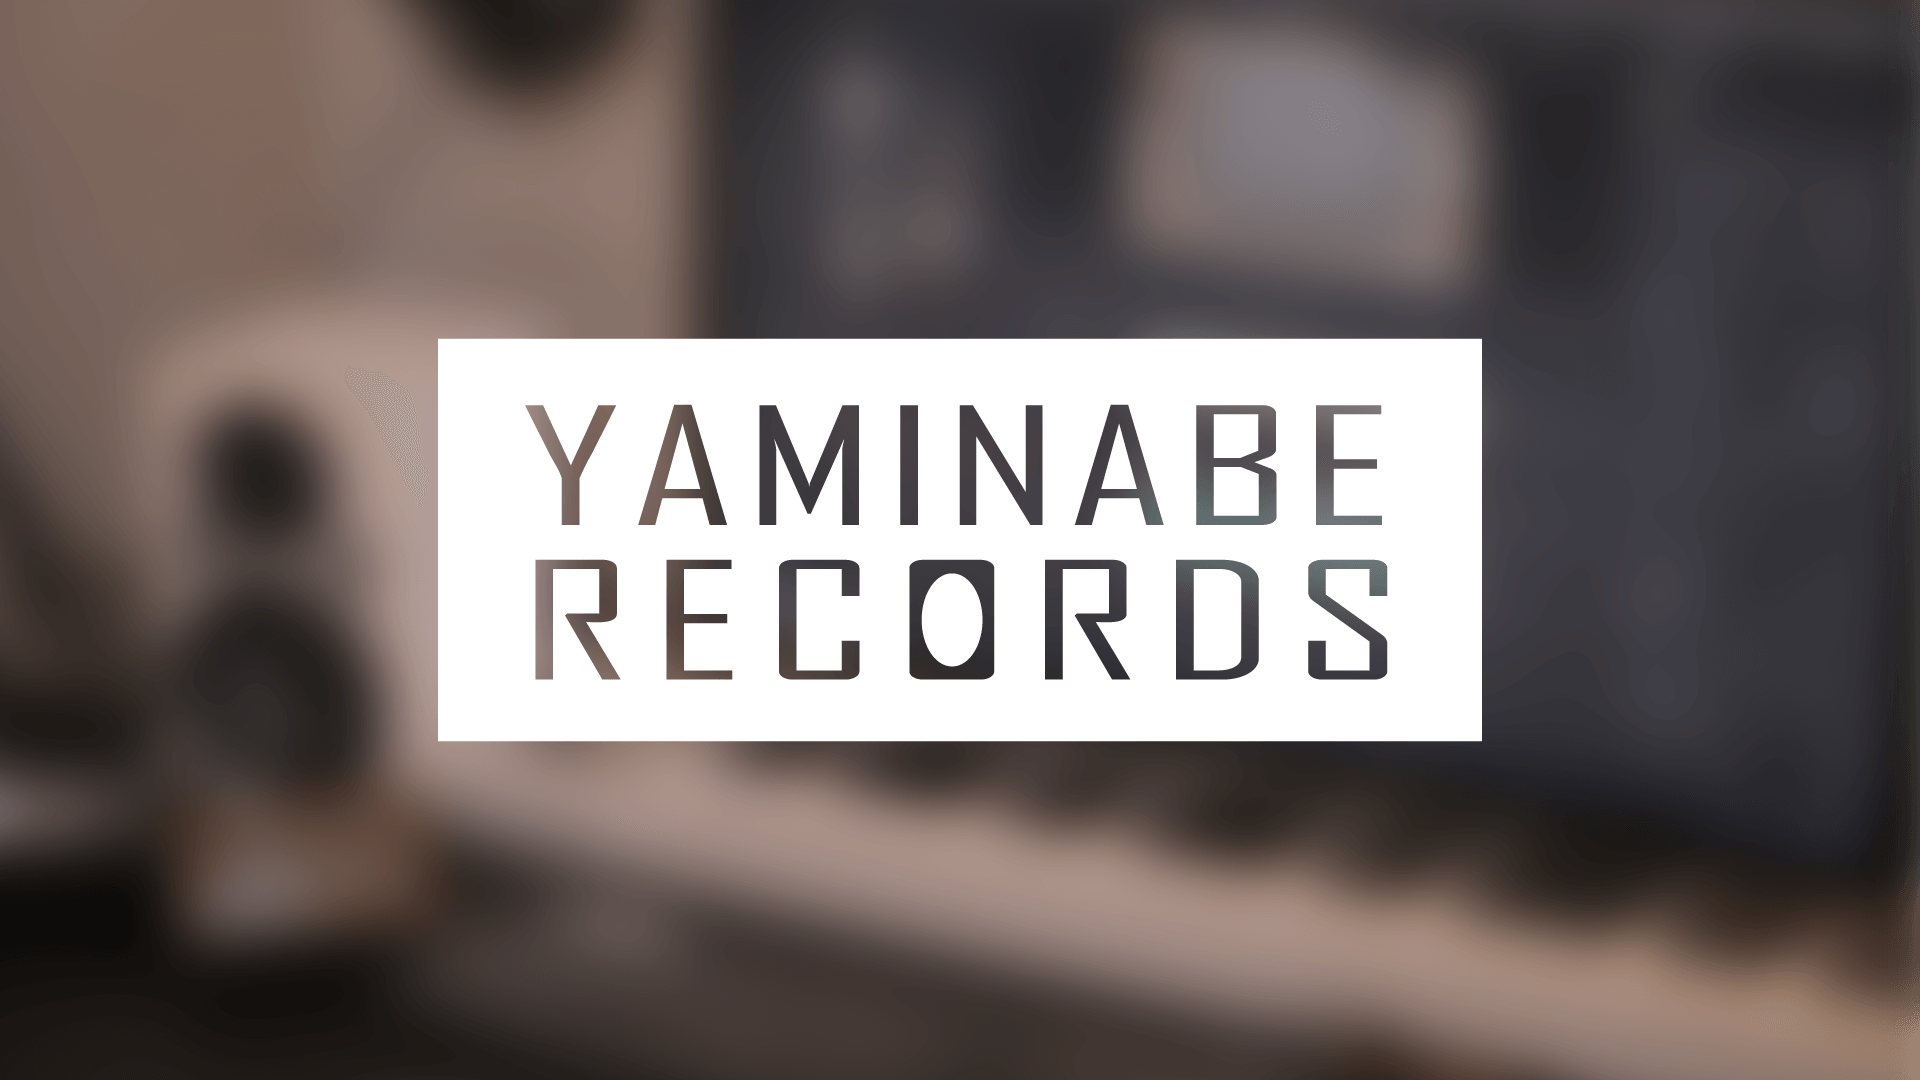 YAMINABE RECORDS